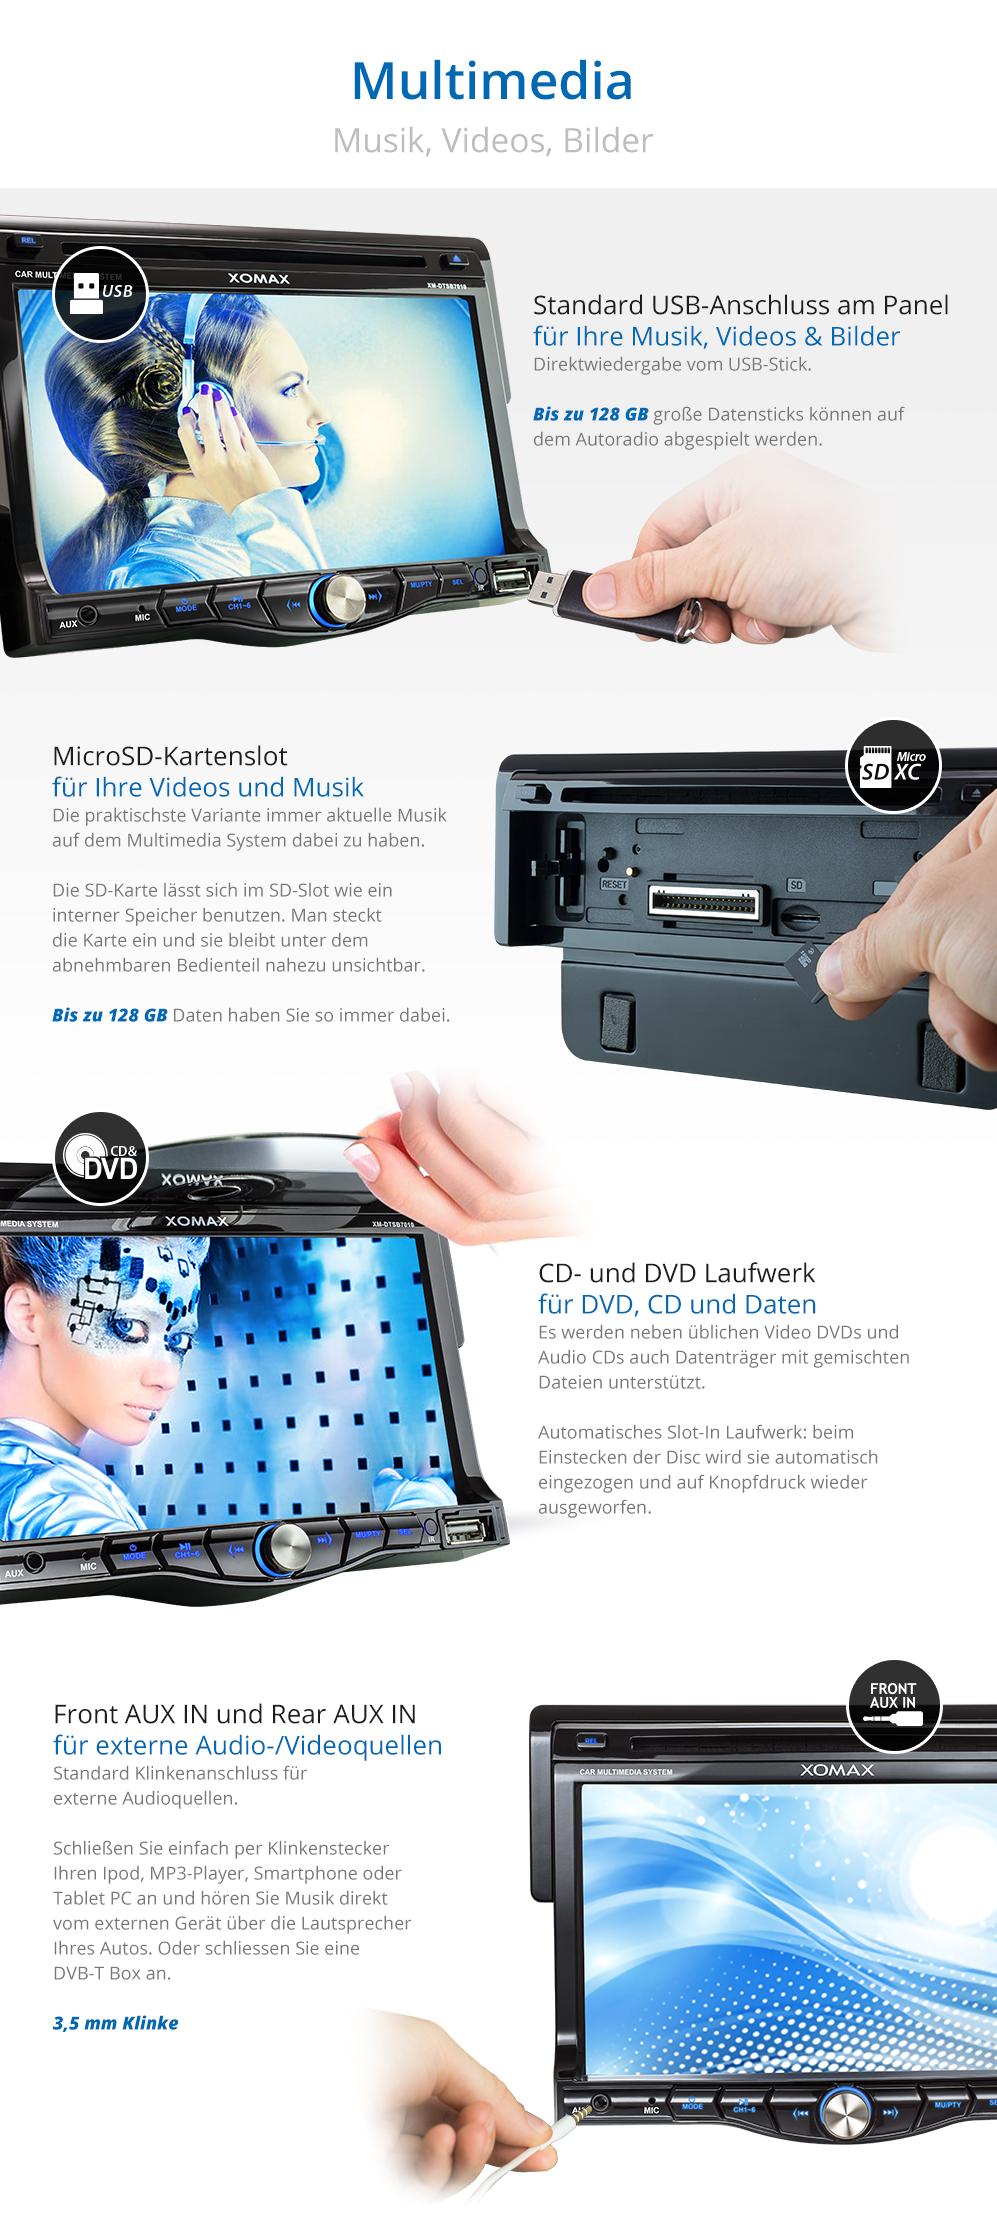 autoradio mit bluetooth 18cm touchscreen dvd cd player usb. Black Bedroom Furniture Sets. Home Design Ideas